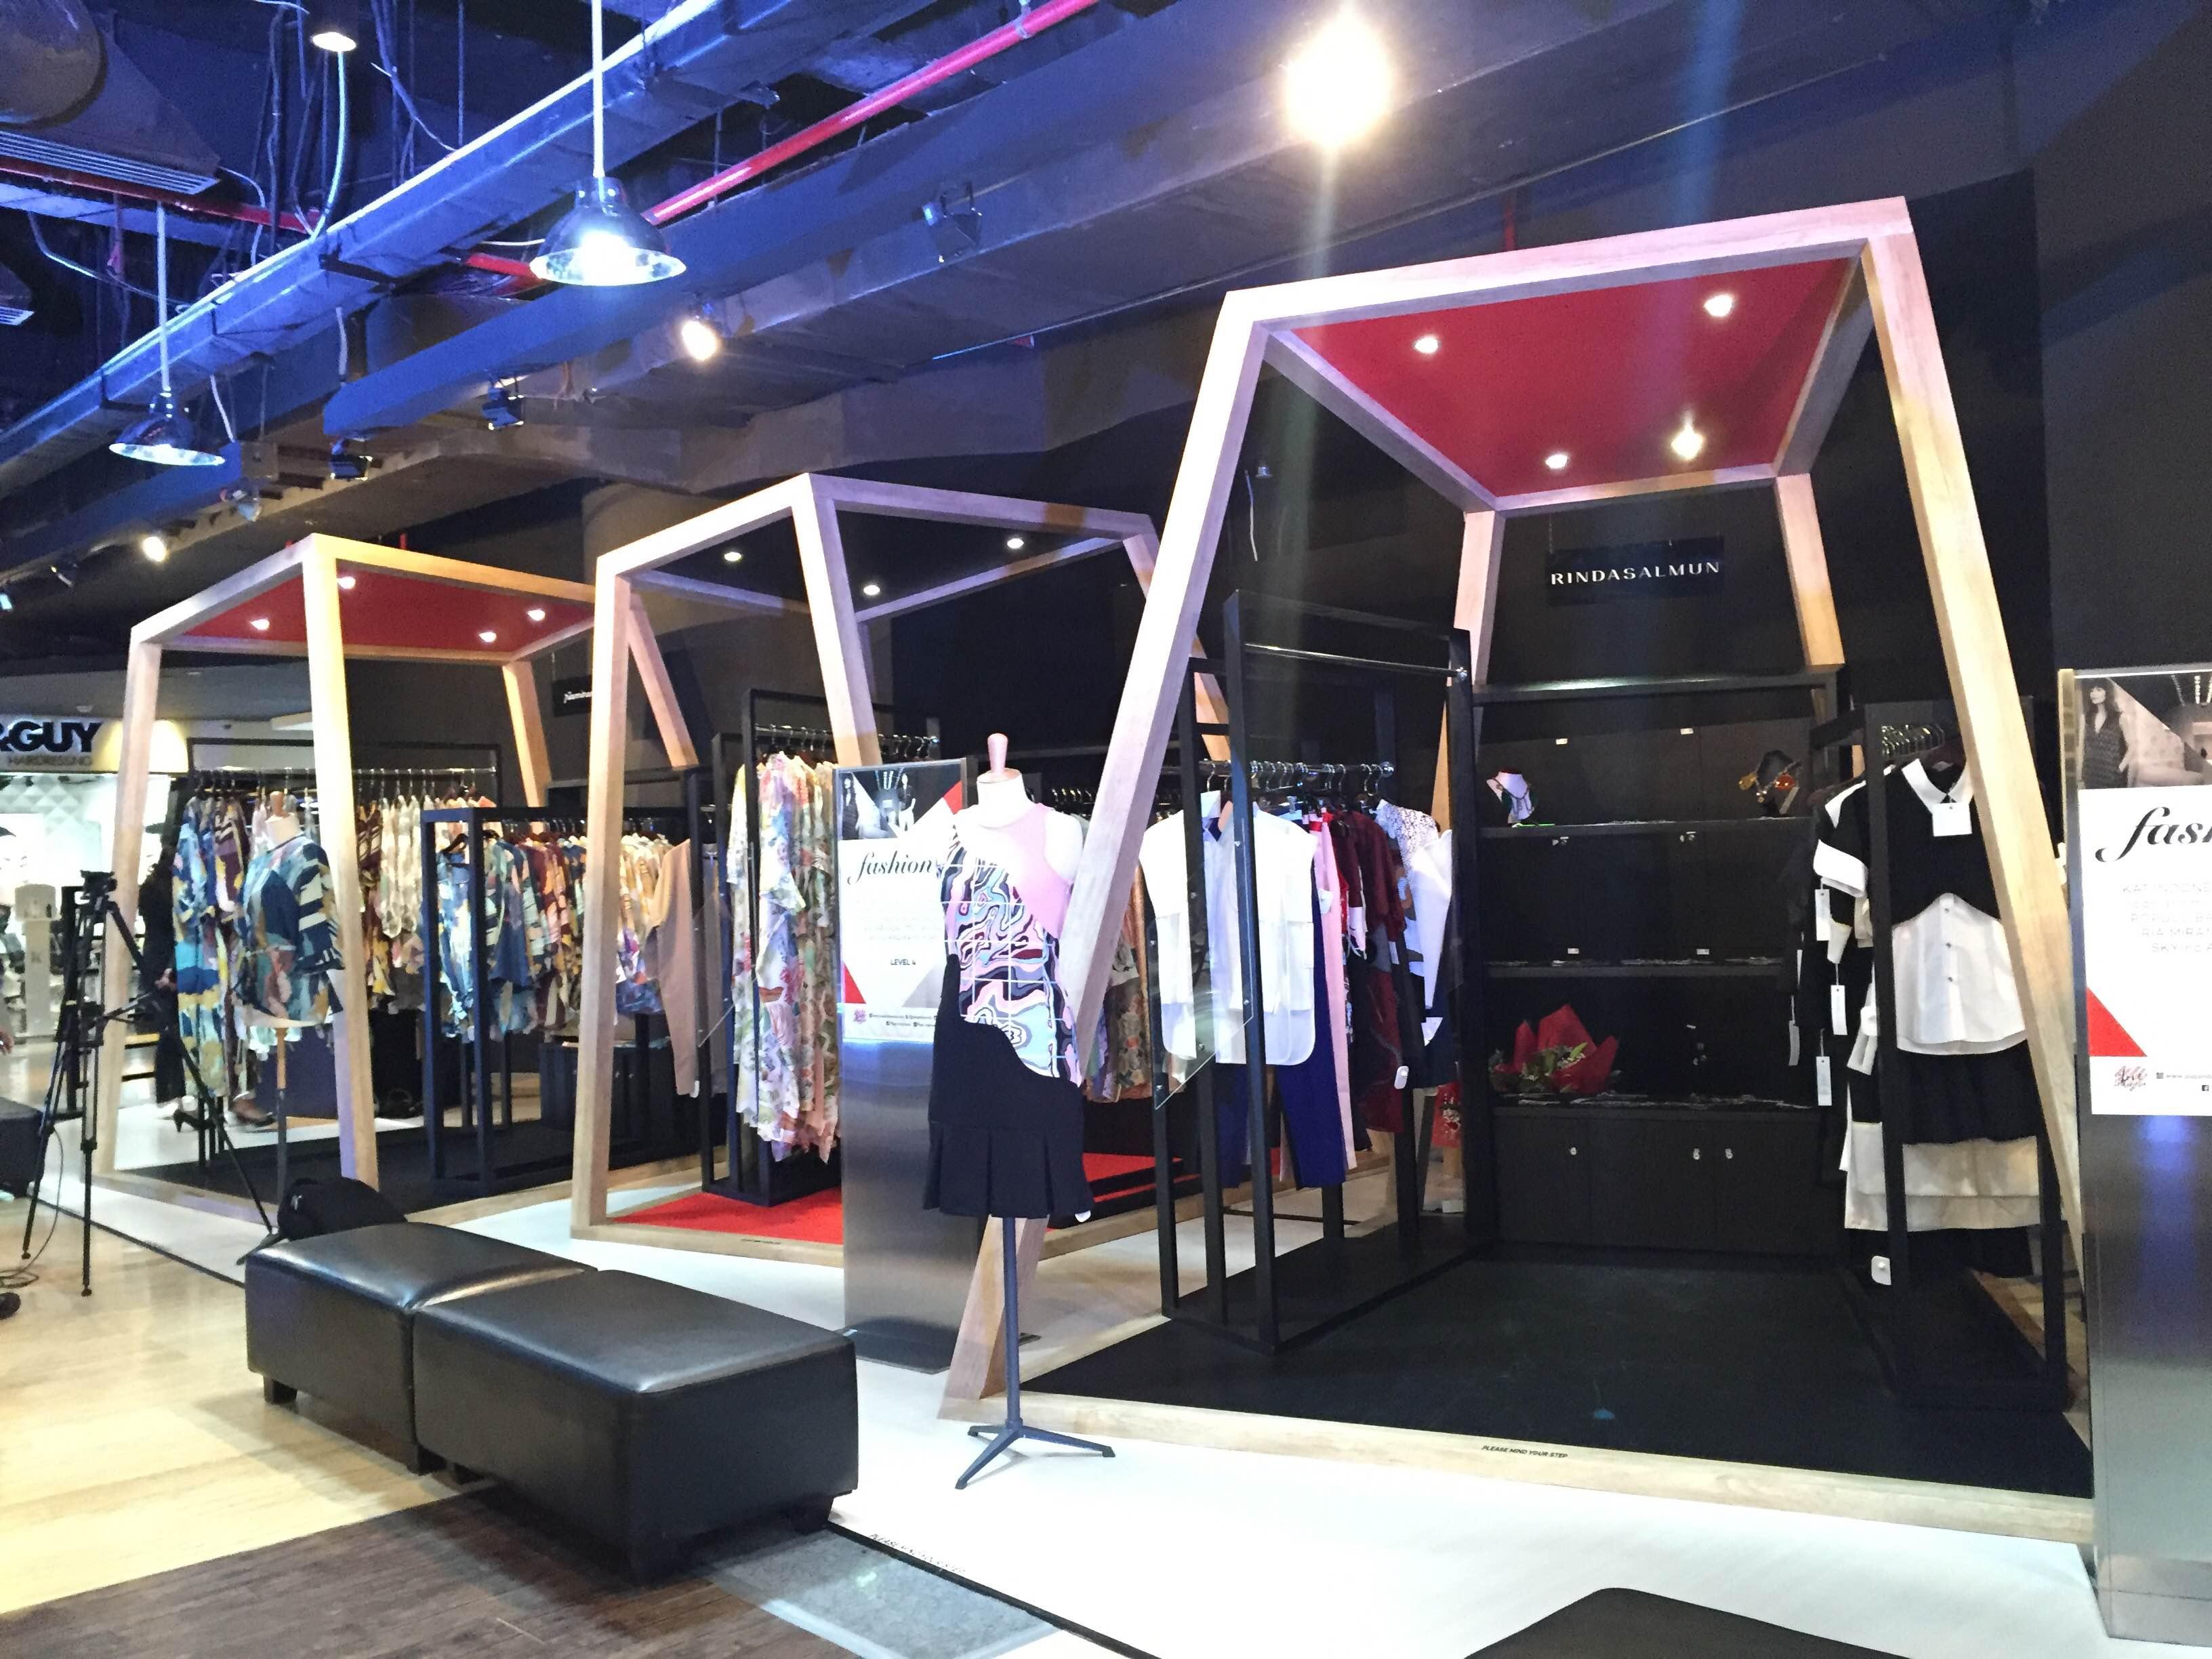 Kumpulan Karya Desainer dan Brand Indonesia Hadir di Fashion On4 Plaza Indonesia